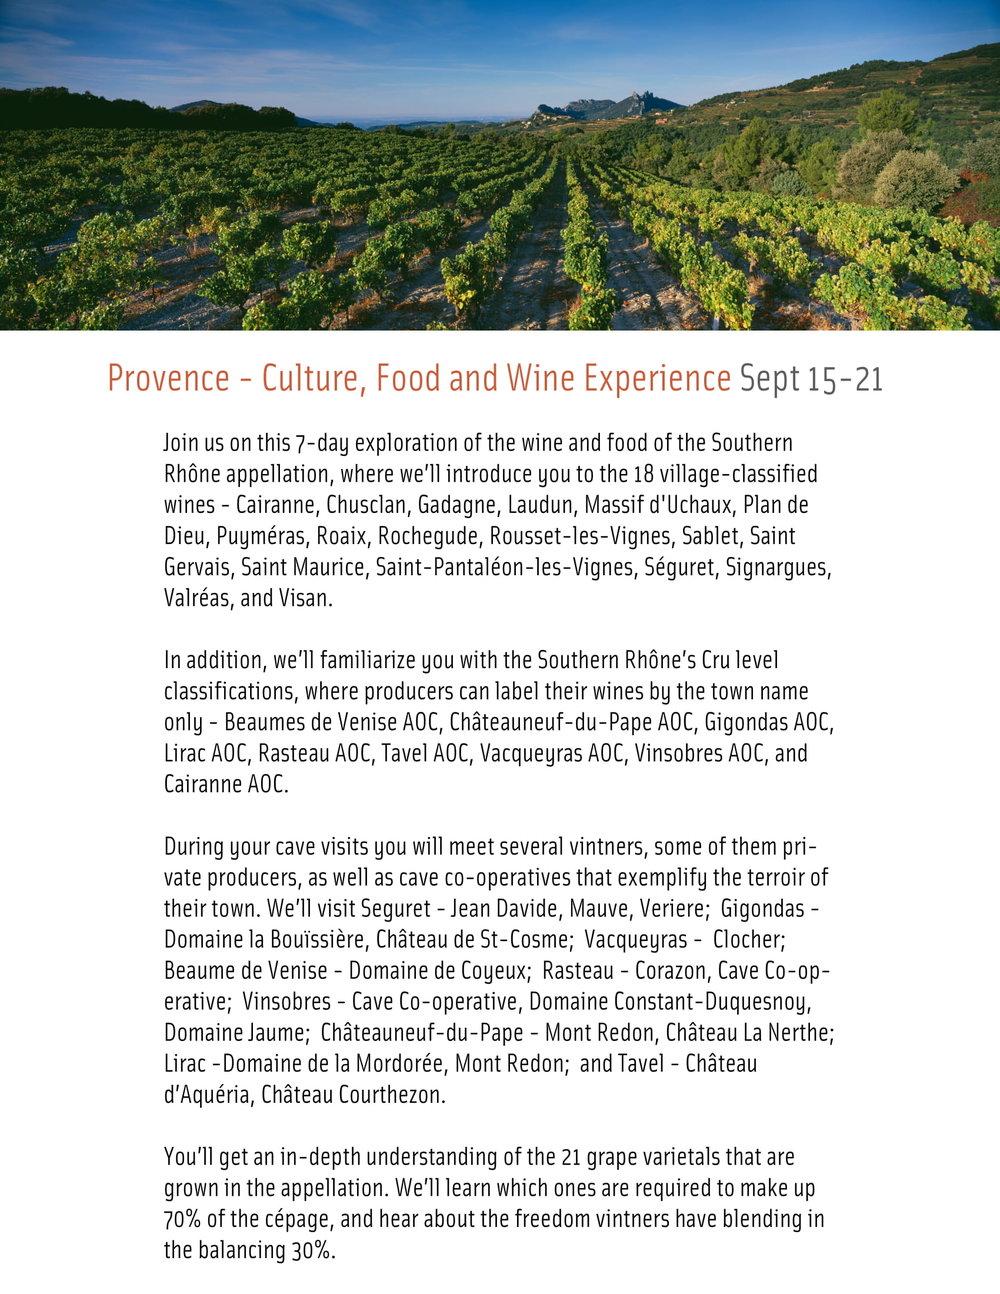 Fall Provence Wine 2018-1.jpg